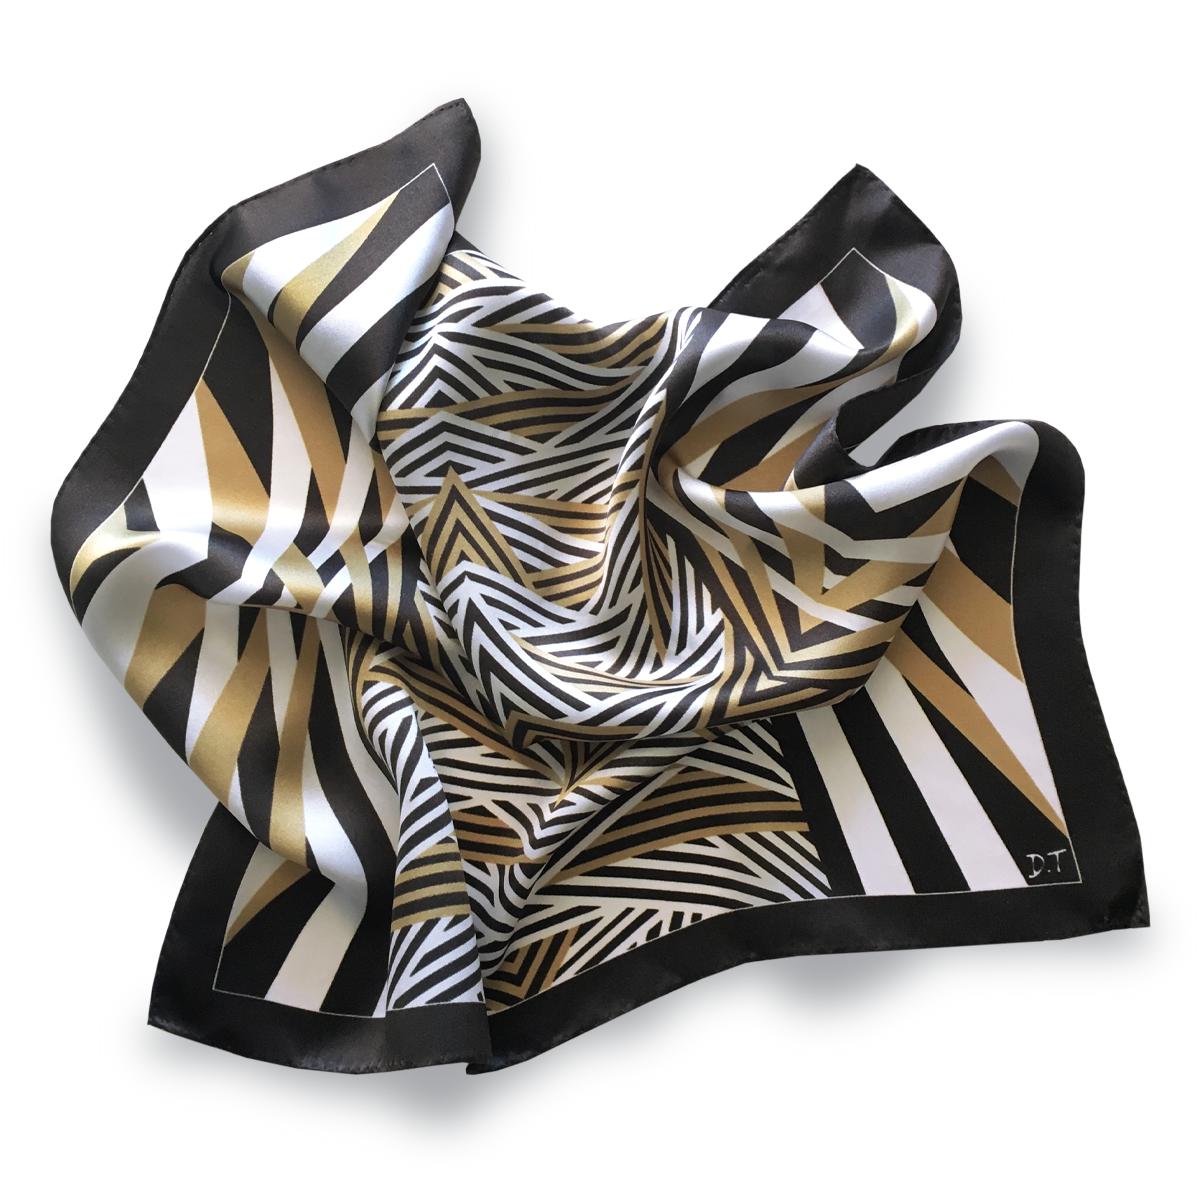 45x45cm Pocket Scarf / Bandana 100% Silk